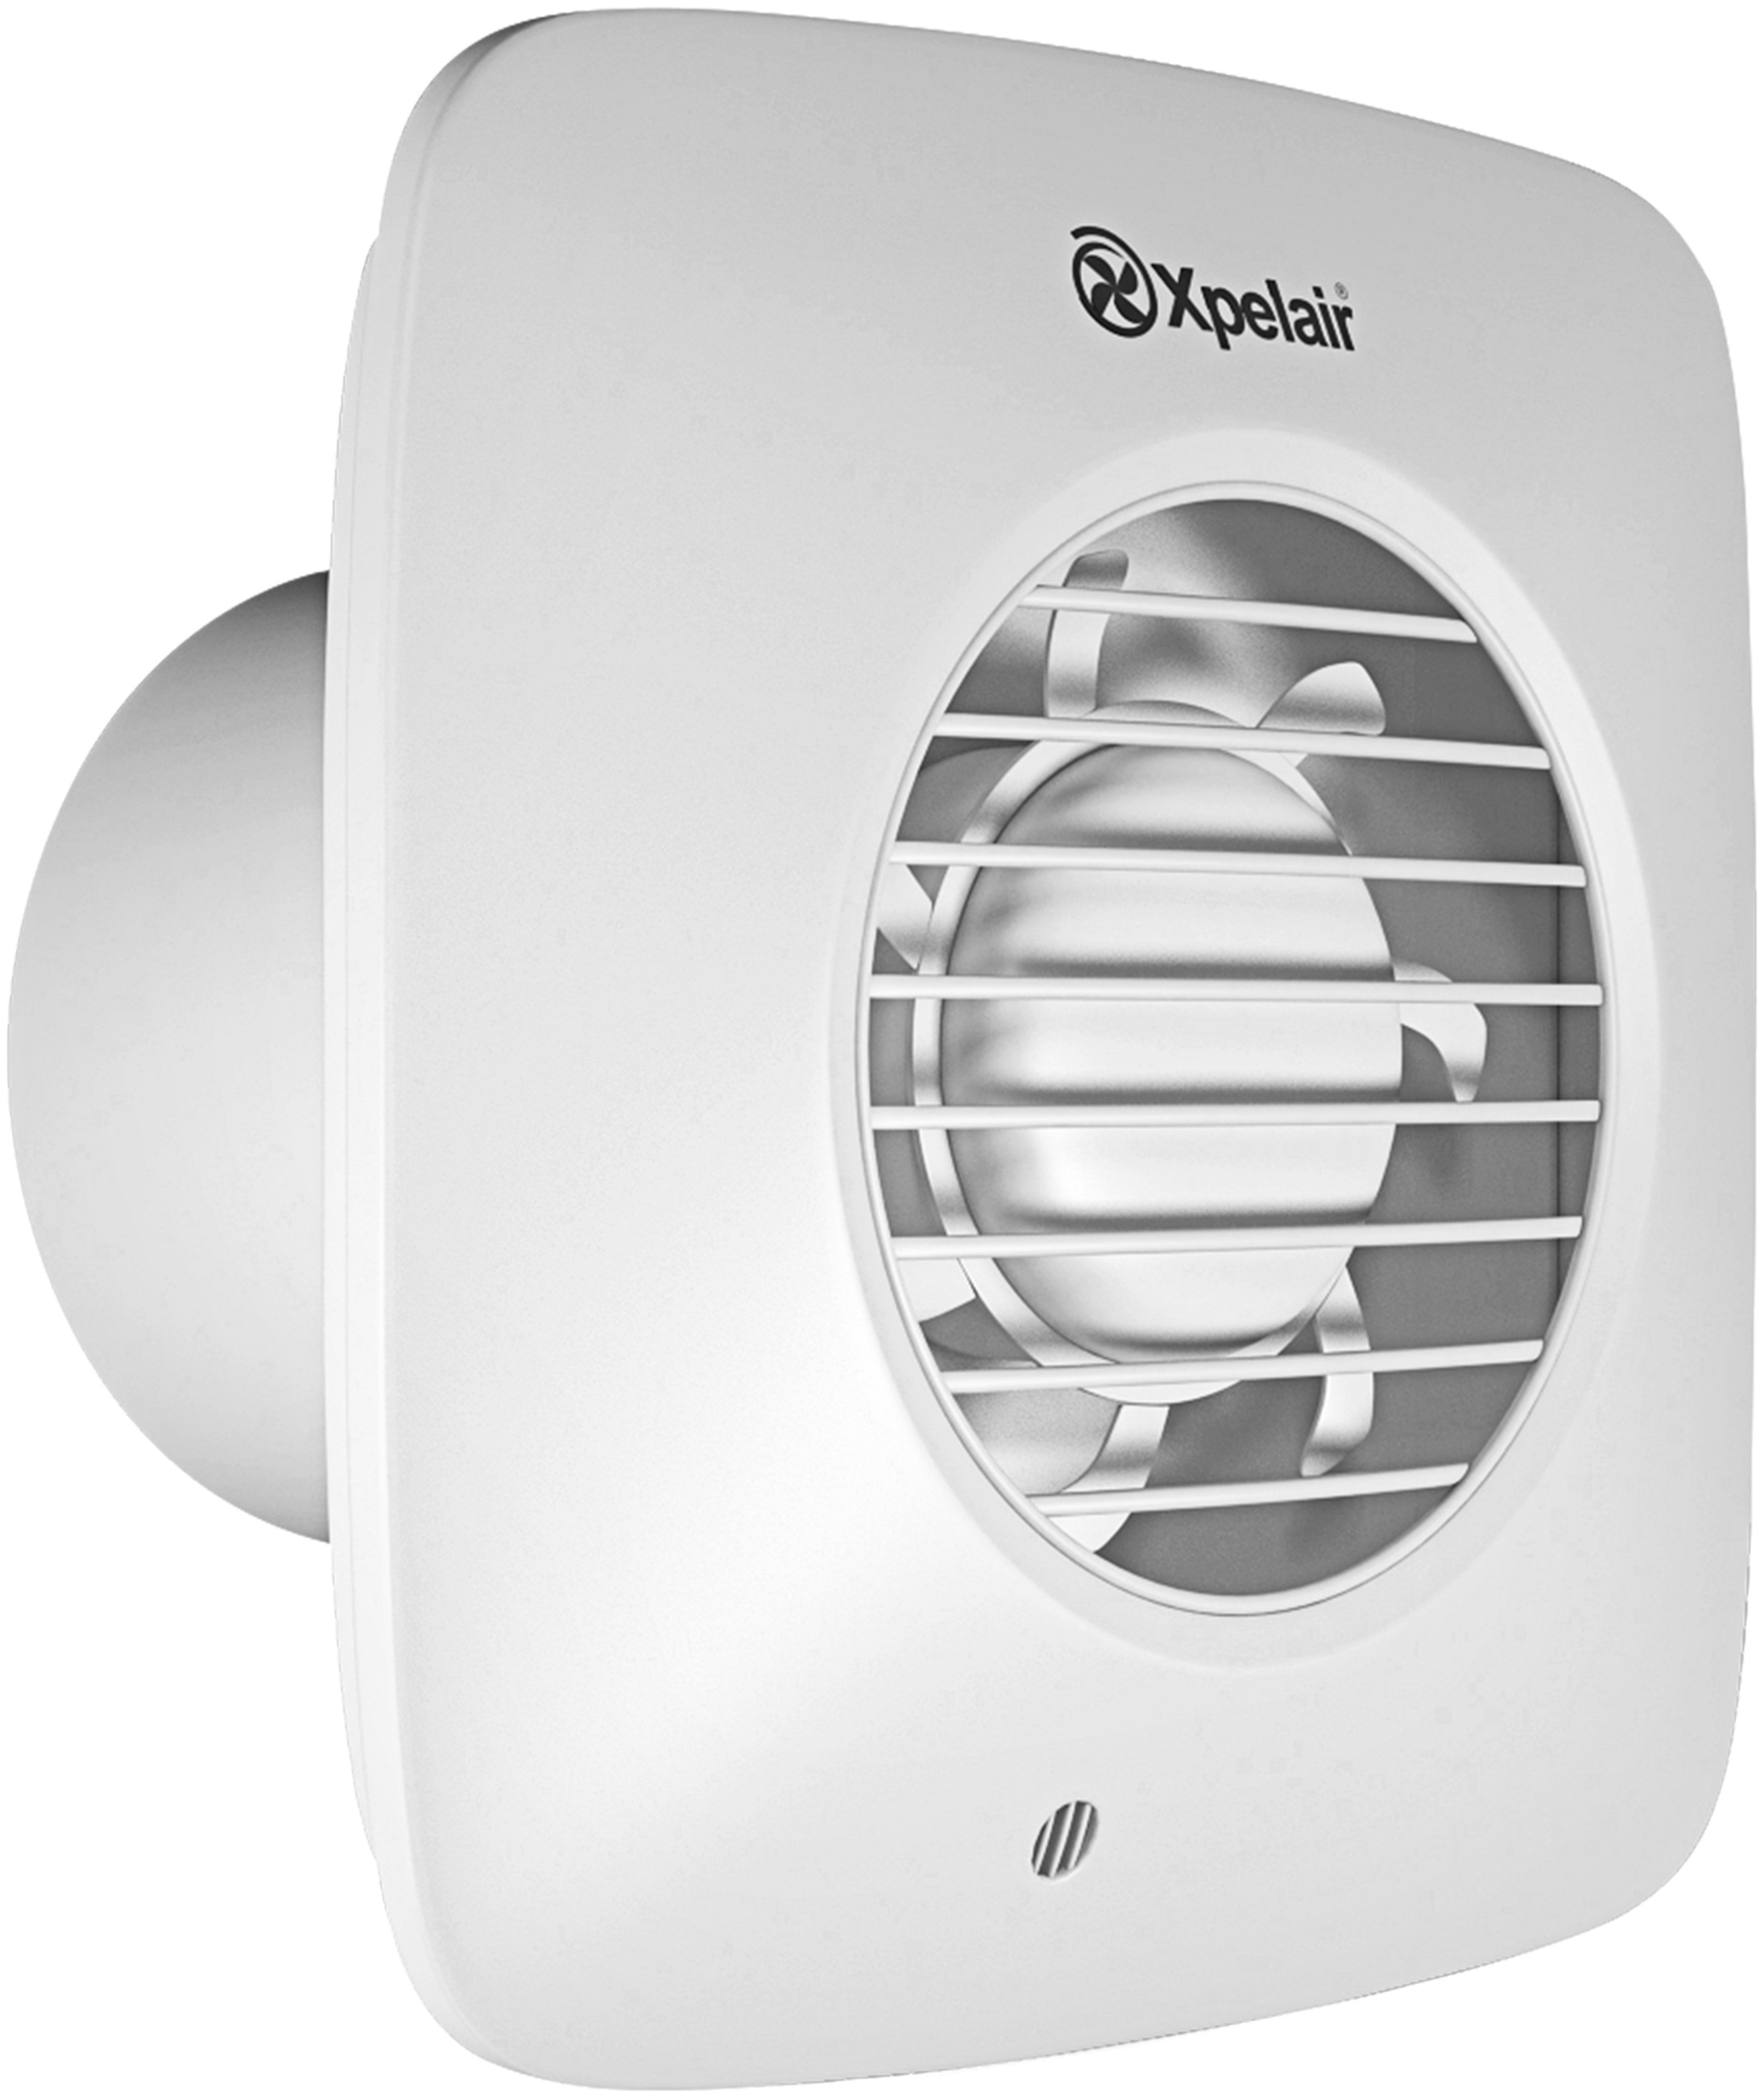 Xpelair DX100 Simply Silent Timer Delay Bathroom Fan